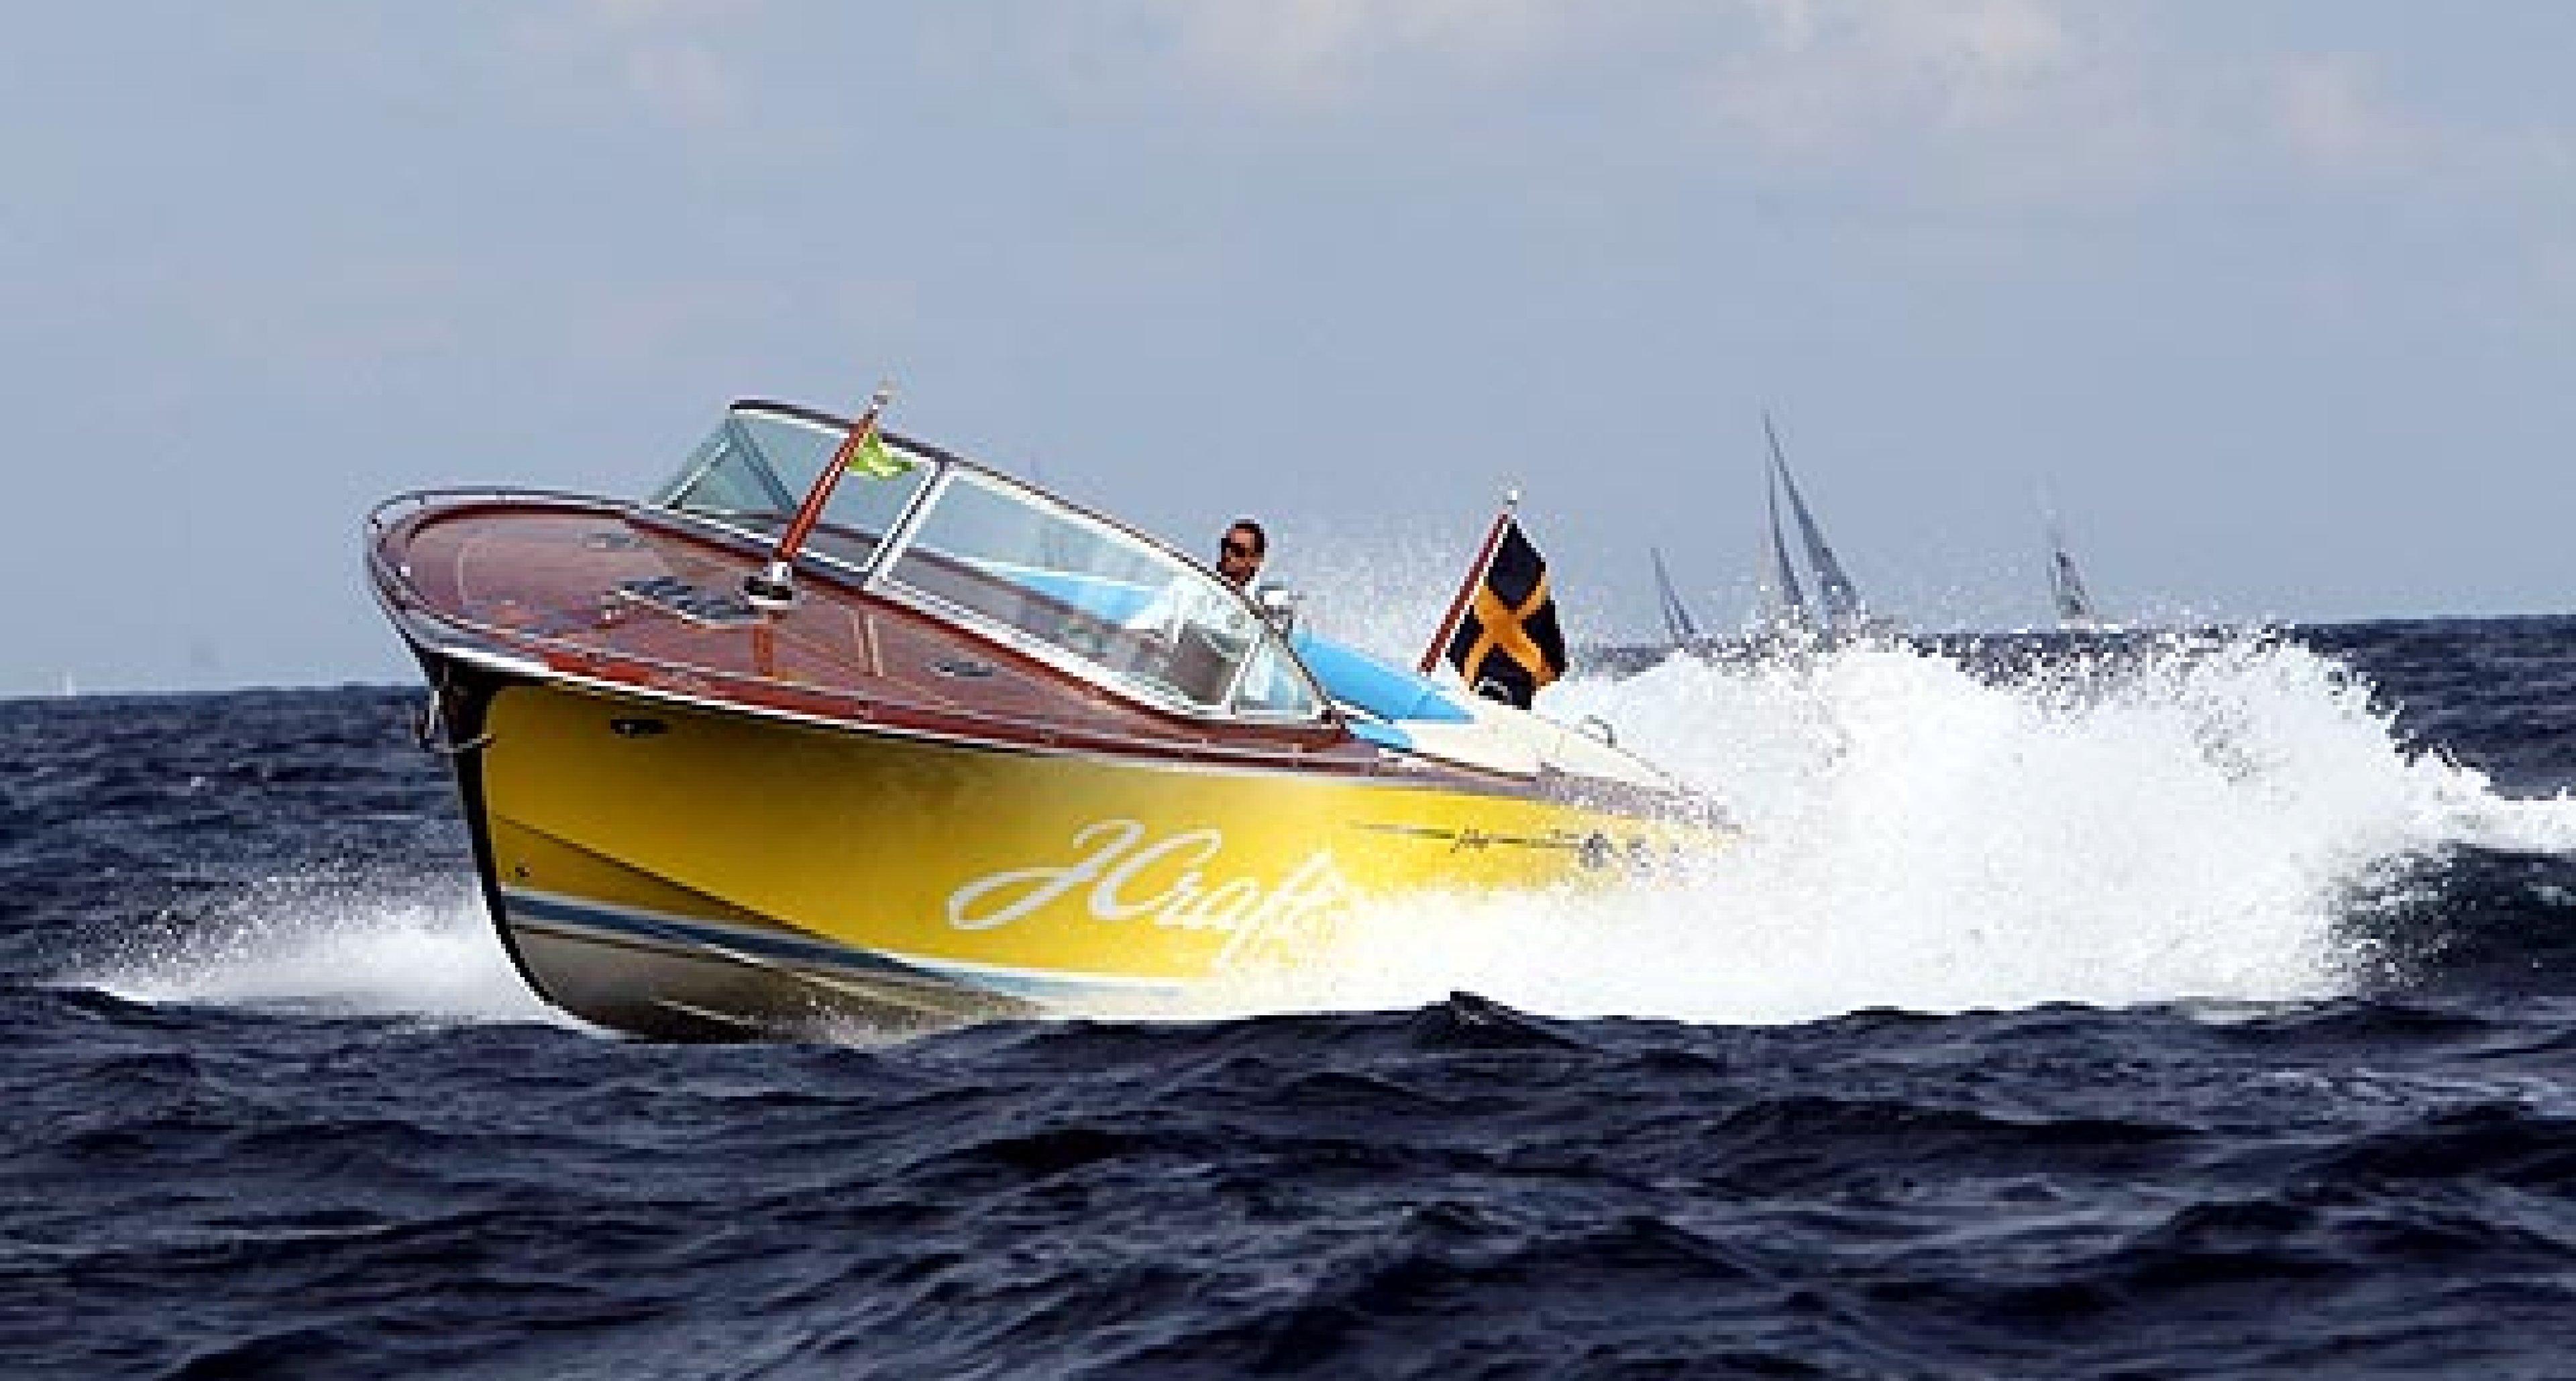 Swedish Speedboats for the USA